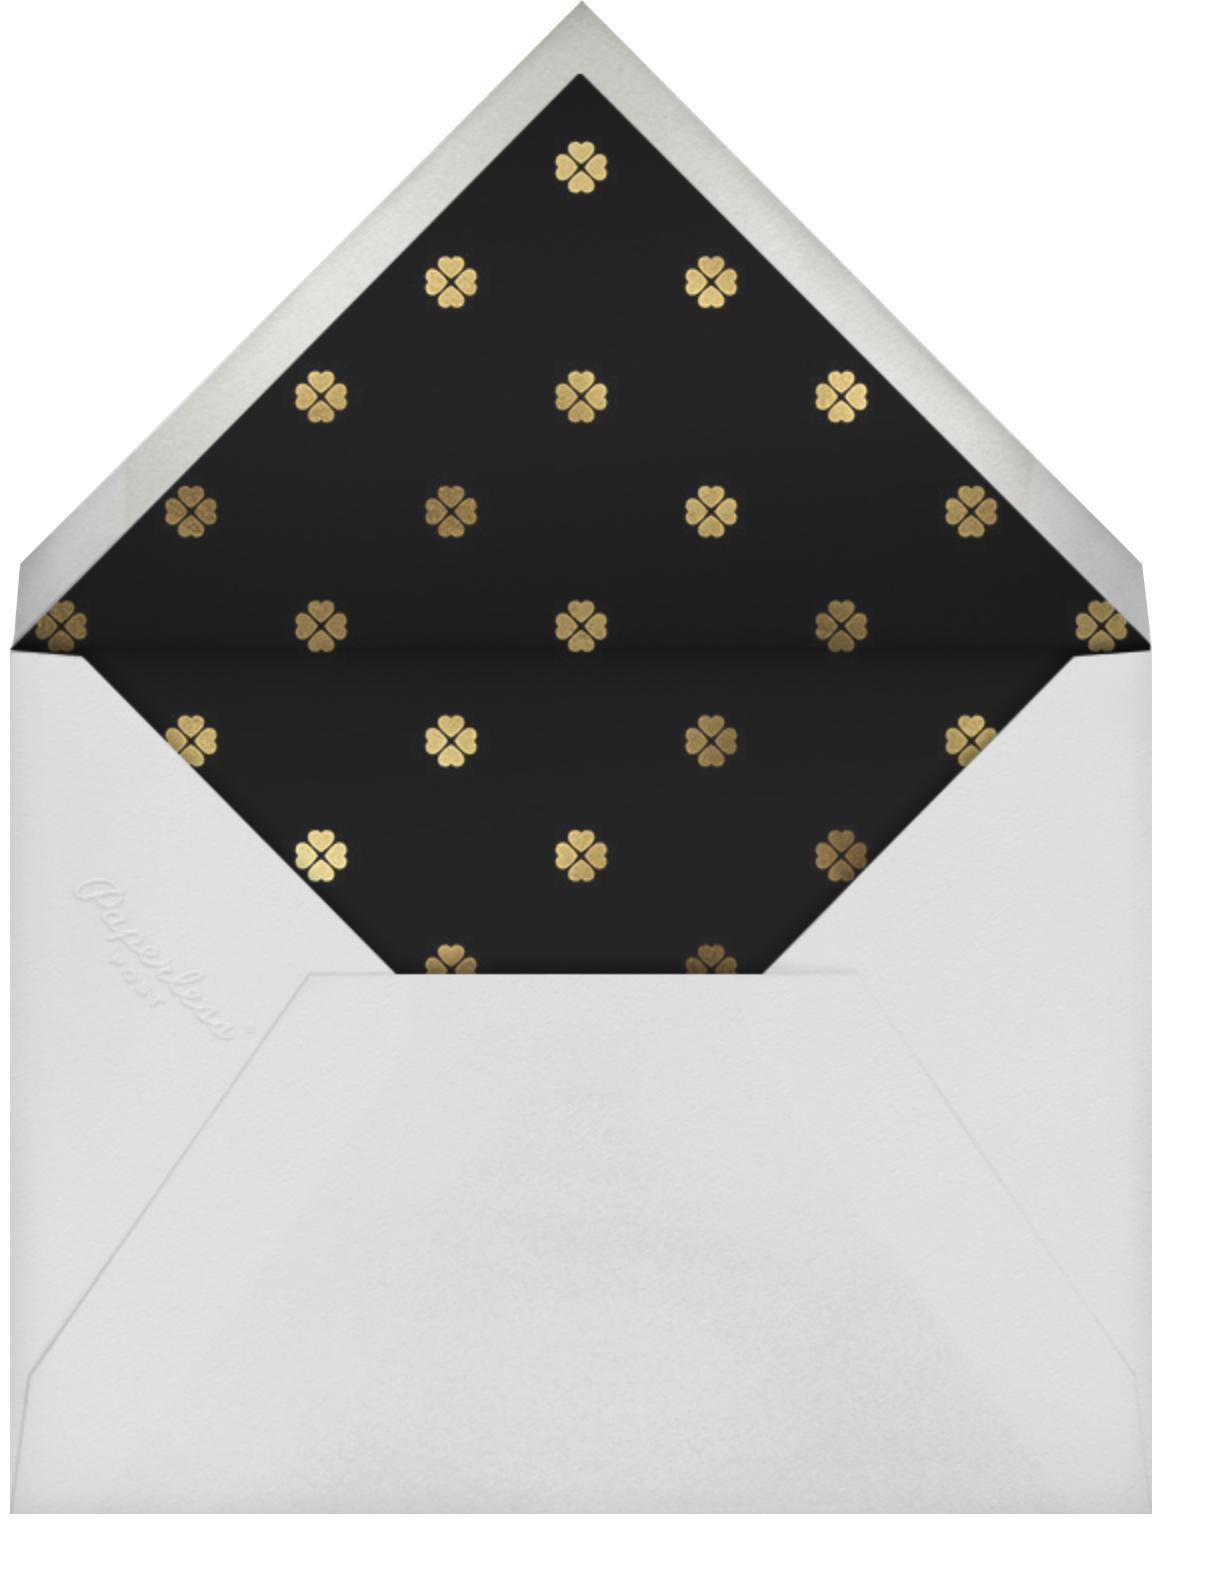 Mini Flowers - Metallic - kate spade new york - Adult birthday - envelope back